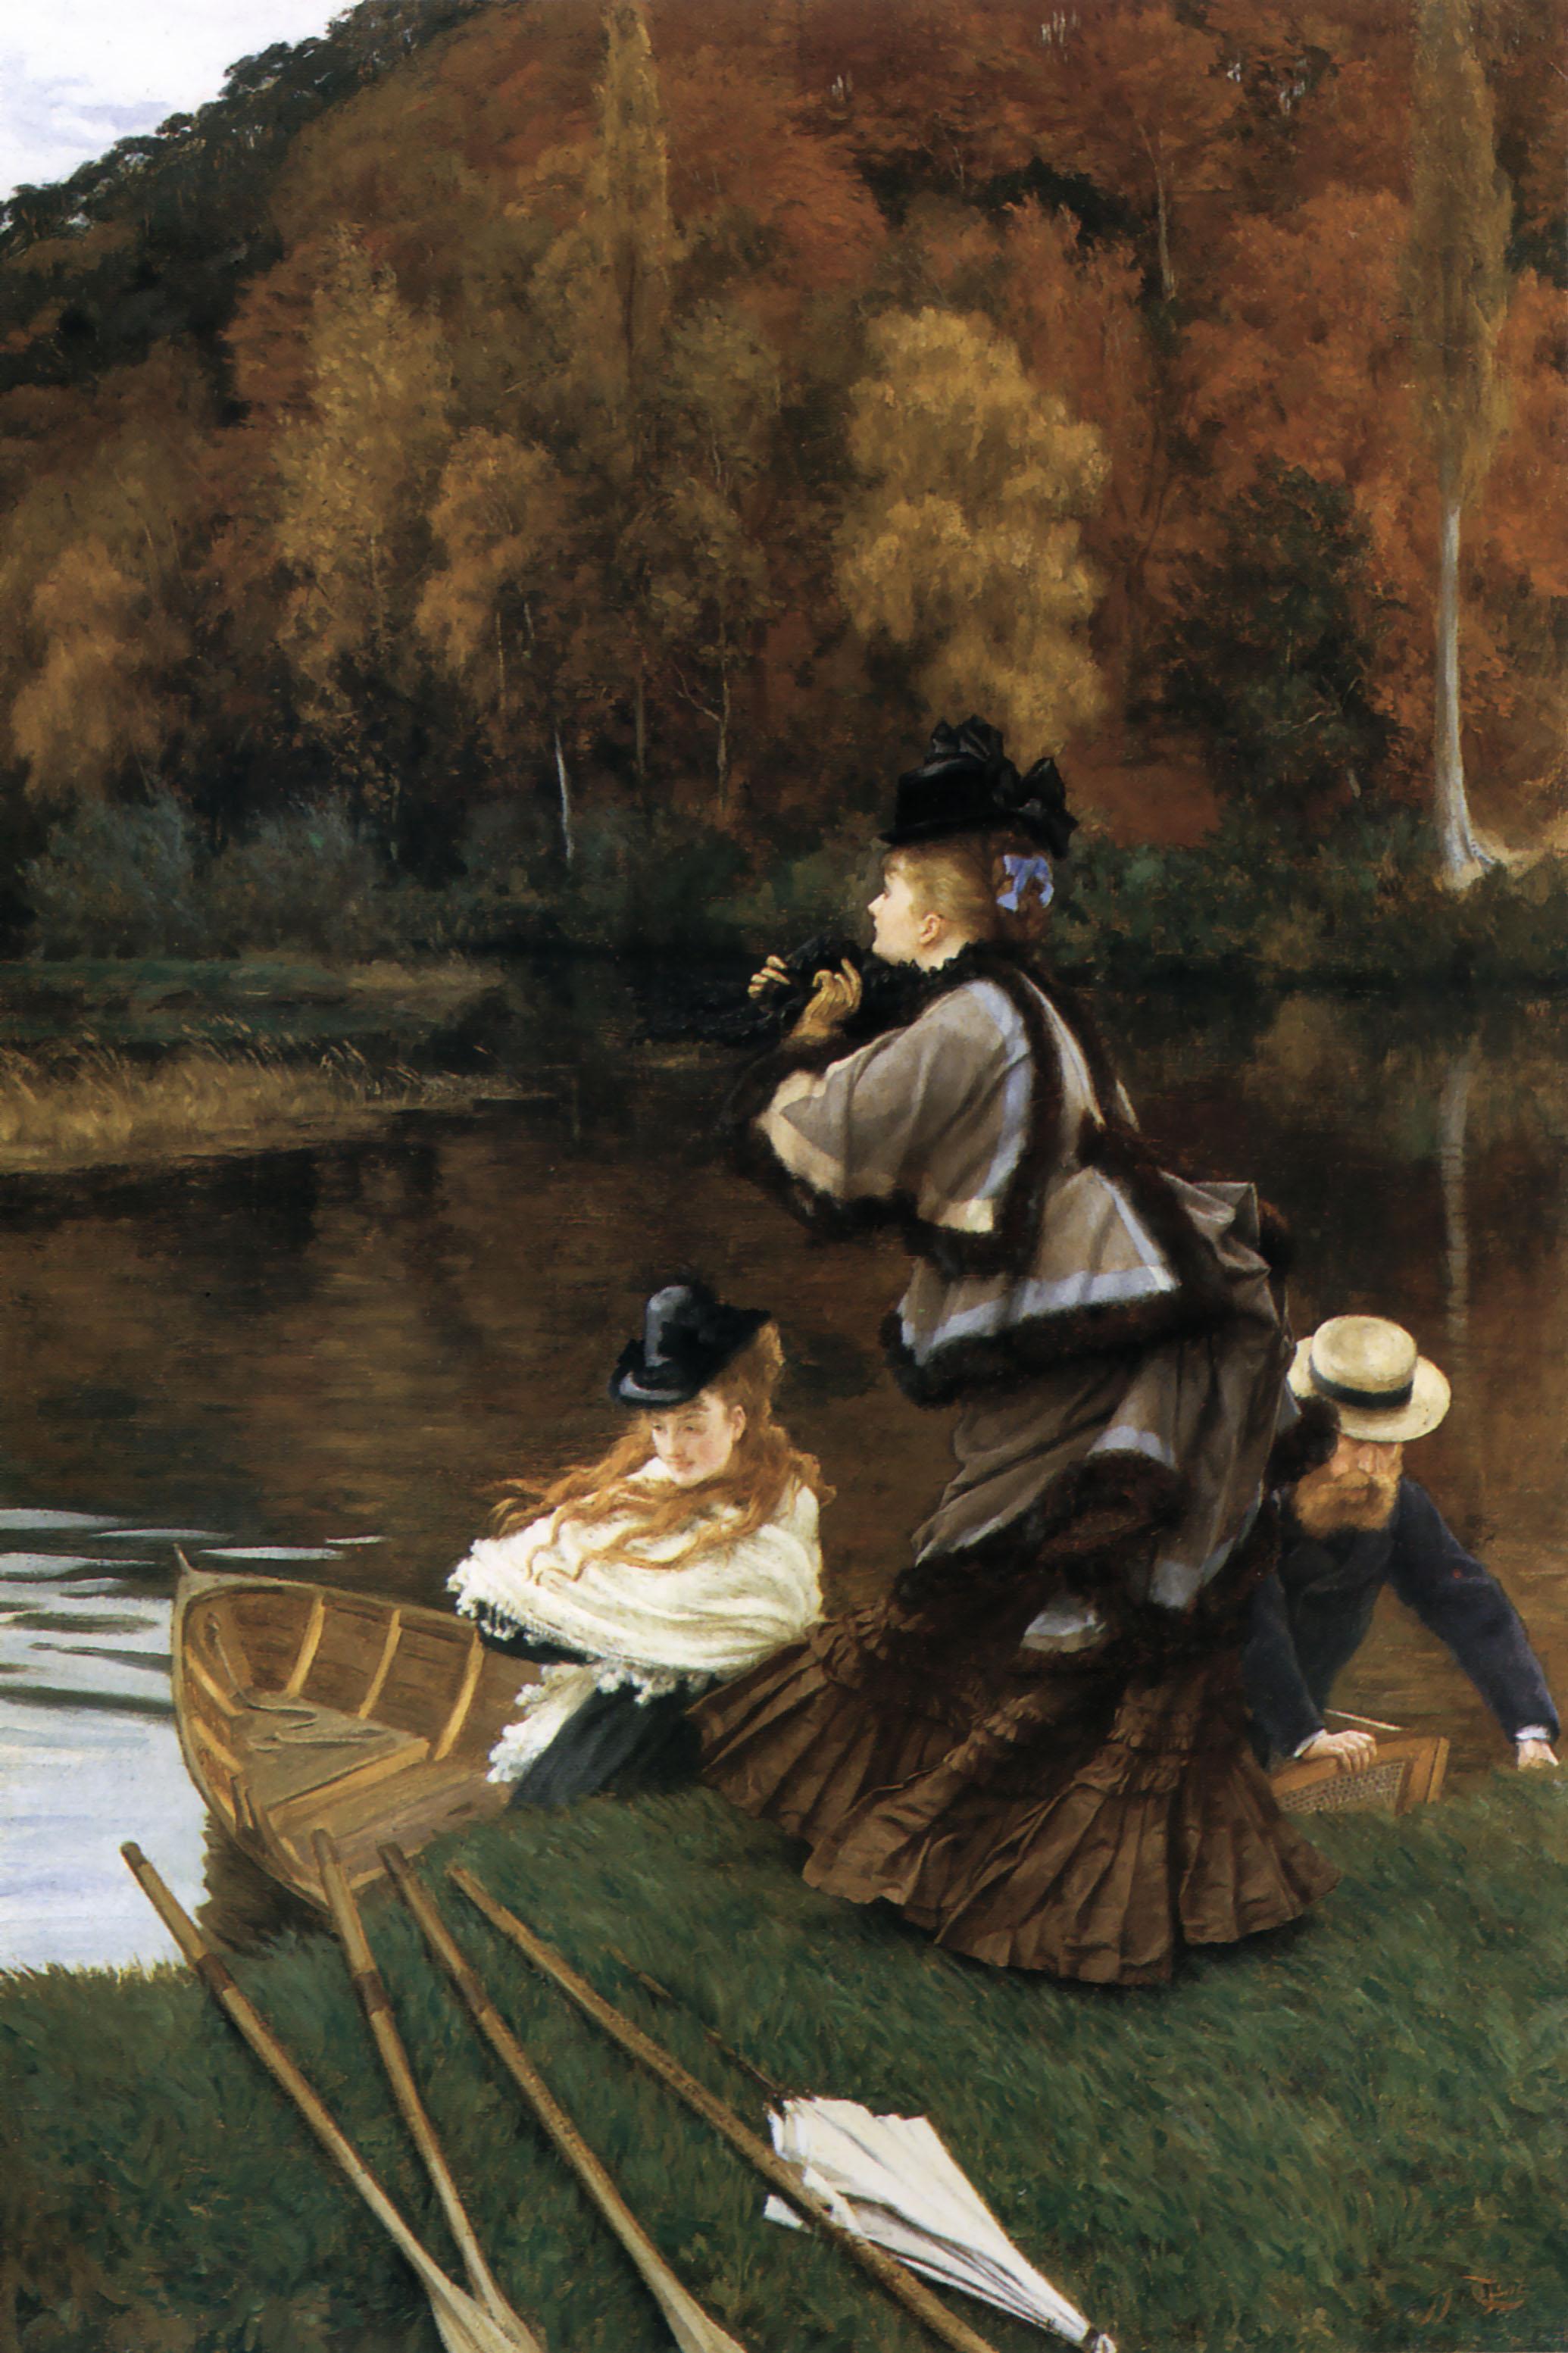 James Tissot, Autumn on the Thames